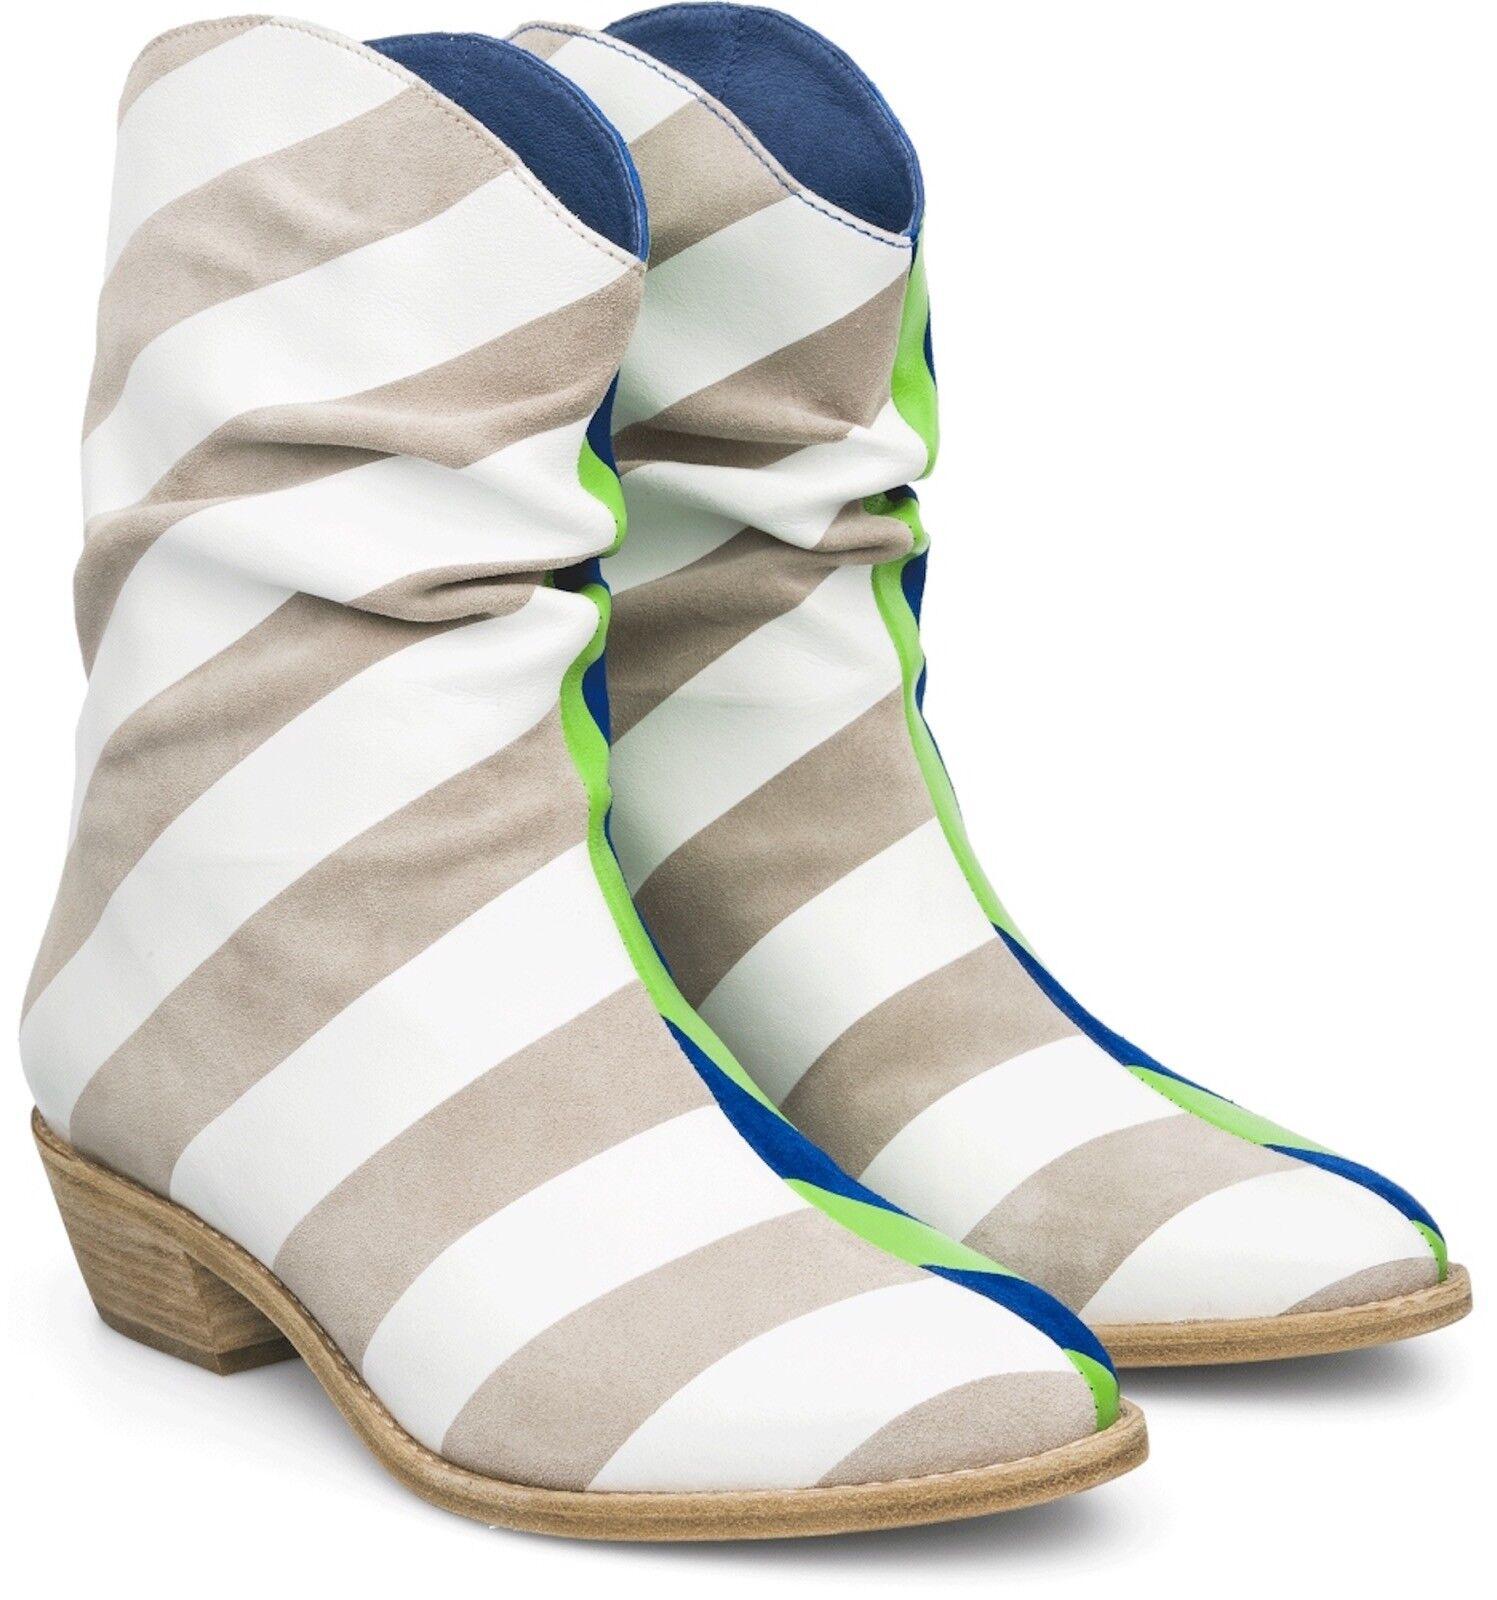 320 Bernhard Willhelm X Camper US 9 EU 39 39 39 Together Twins Ankle Stiefel 46721-001 439862